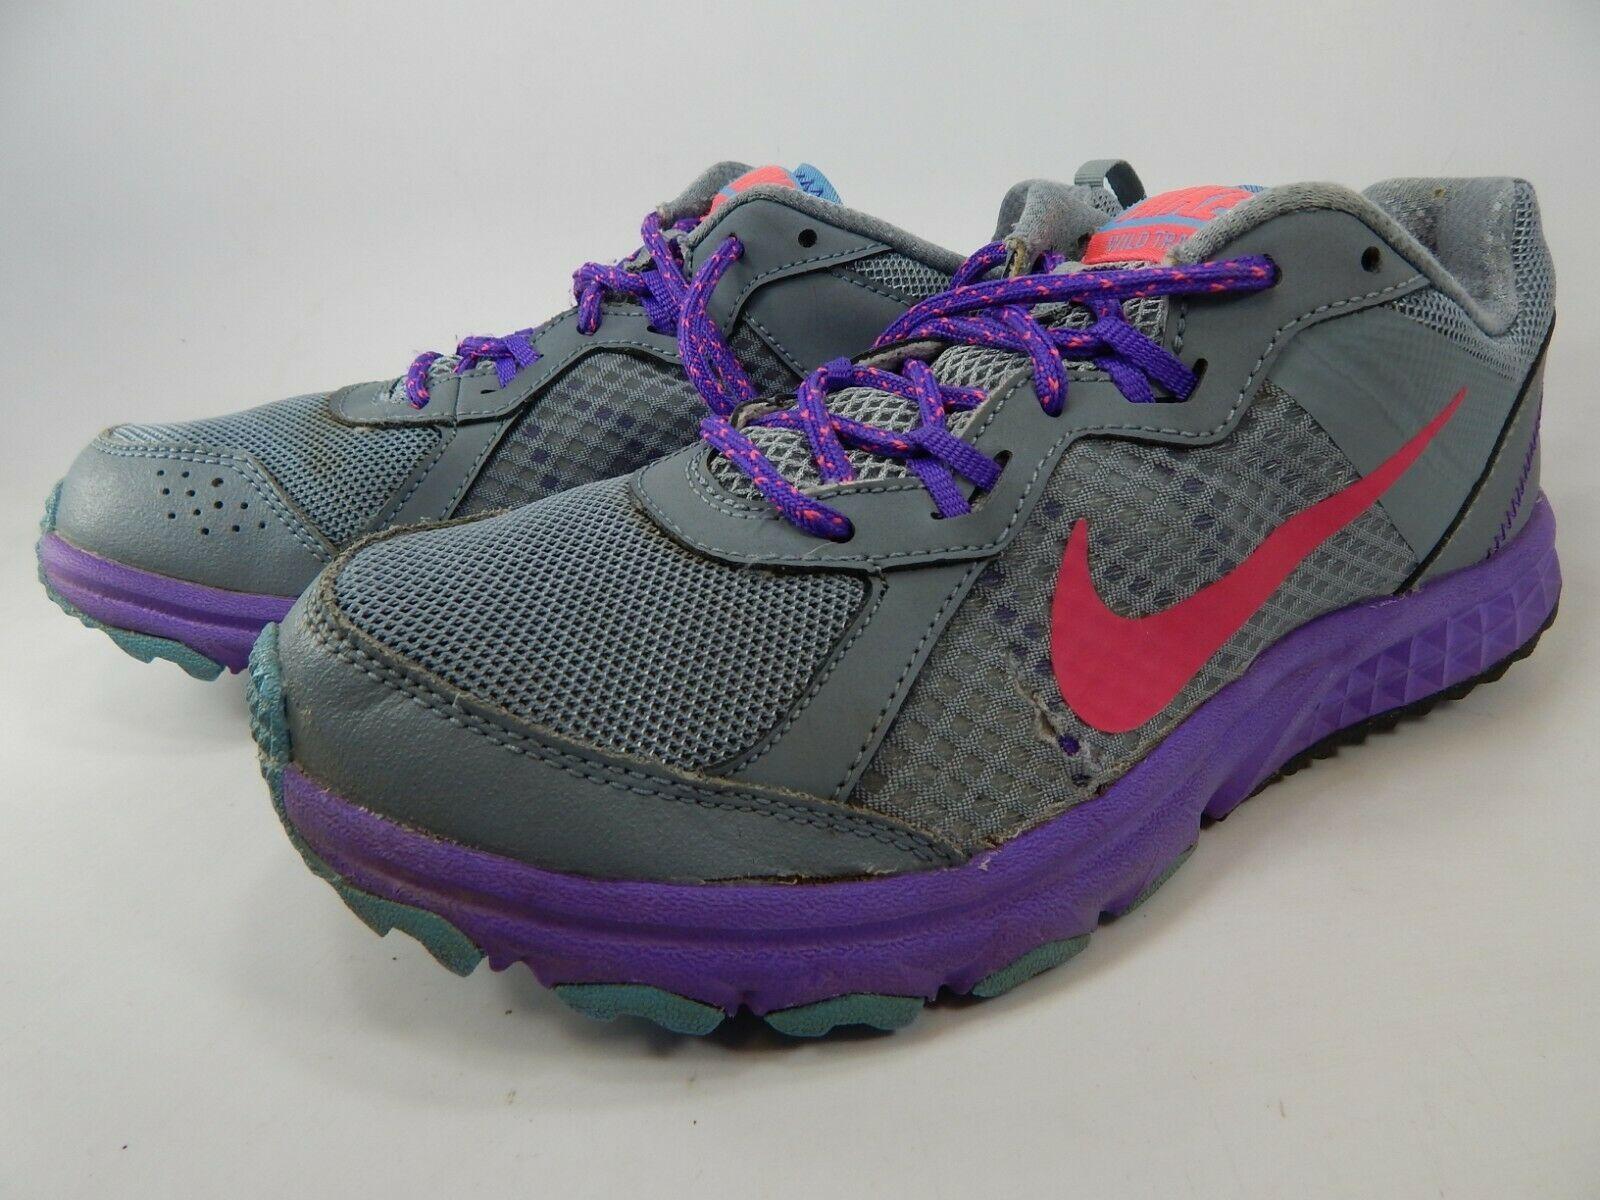 big sale bc612 8551d Nike Wild Trail Size 9 M (B) EU 40.5 Women s Trail Running Shoes Gray